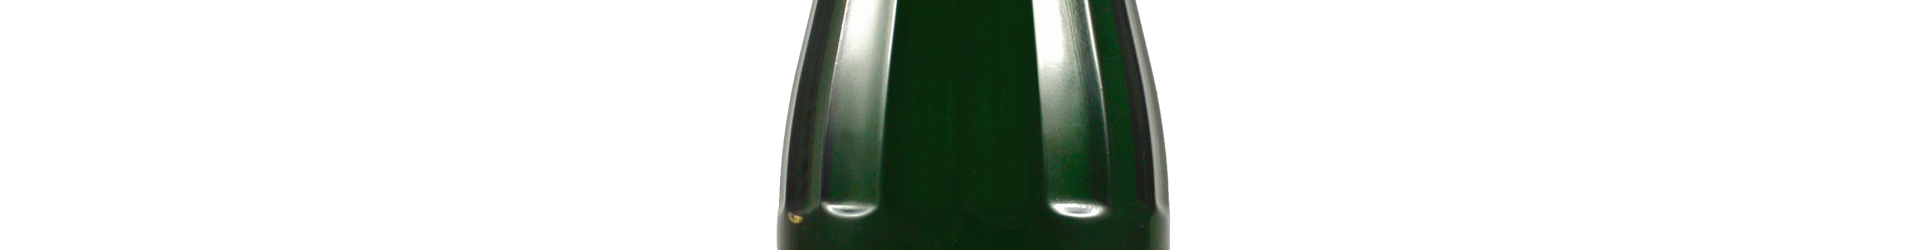 2015er Hallgartener Jungfer – Riesling Auslese edelsüß